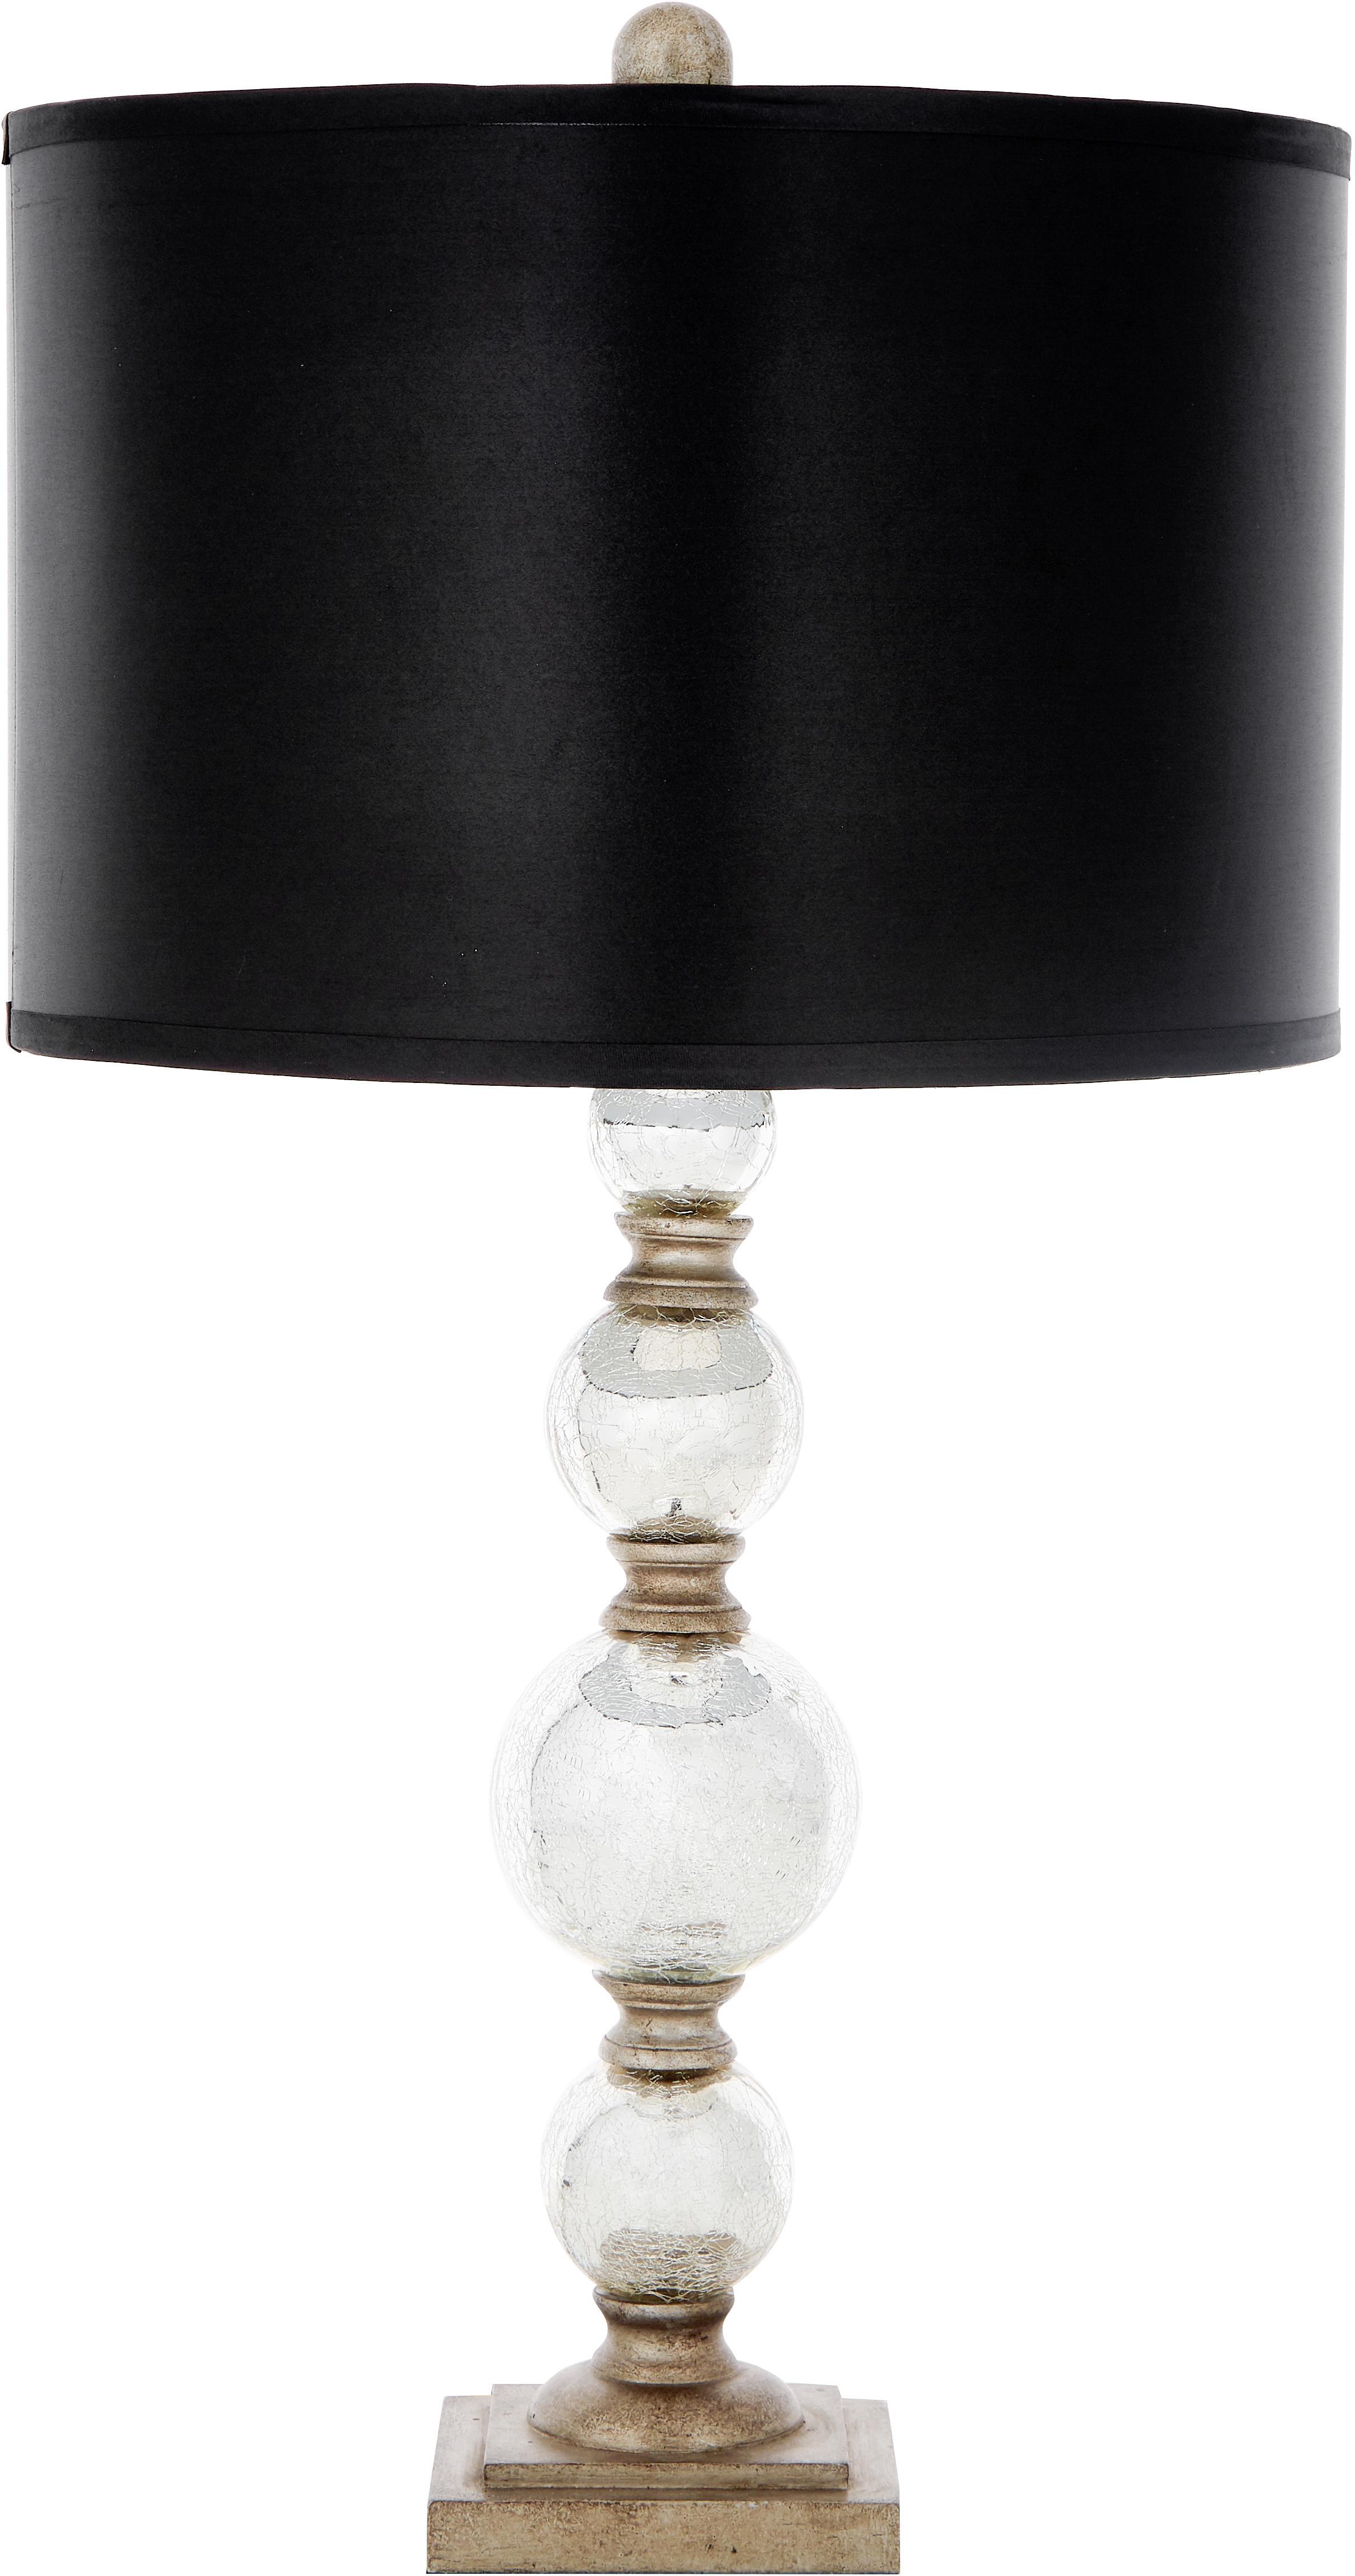 Lampa stołowa XL Balls, 2 szt., Czarny, srebrny, Ø 35 x W 75 cm